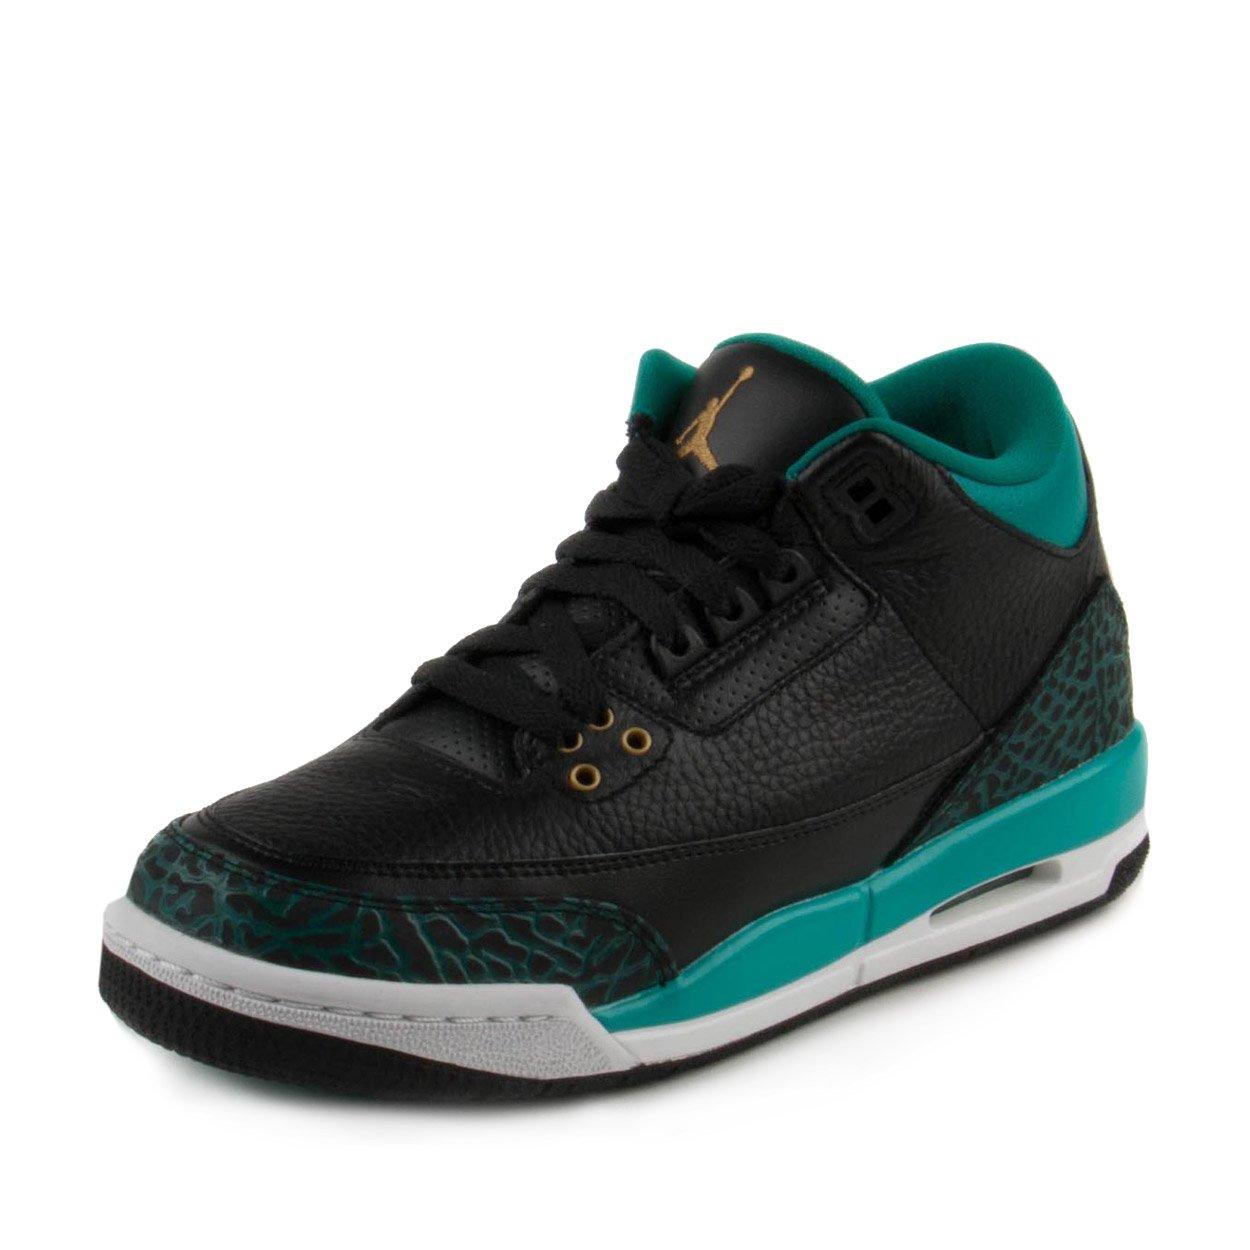 separation shoes 36b25 28aca Galleon - Nike Youth Air Jordan 3 Retro GG 441140 018 Black Teal (8 M US  Big Kid)